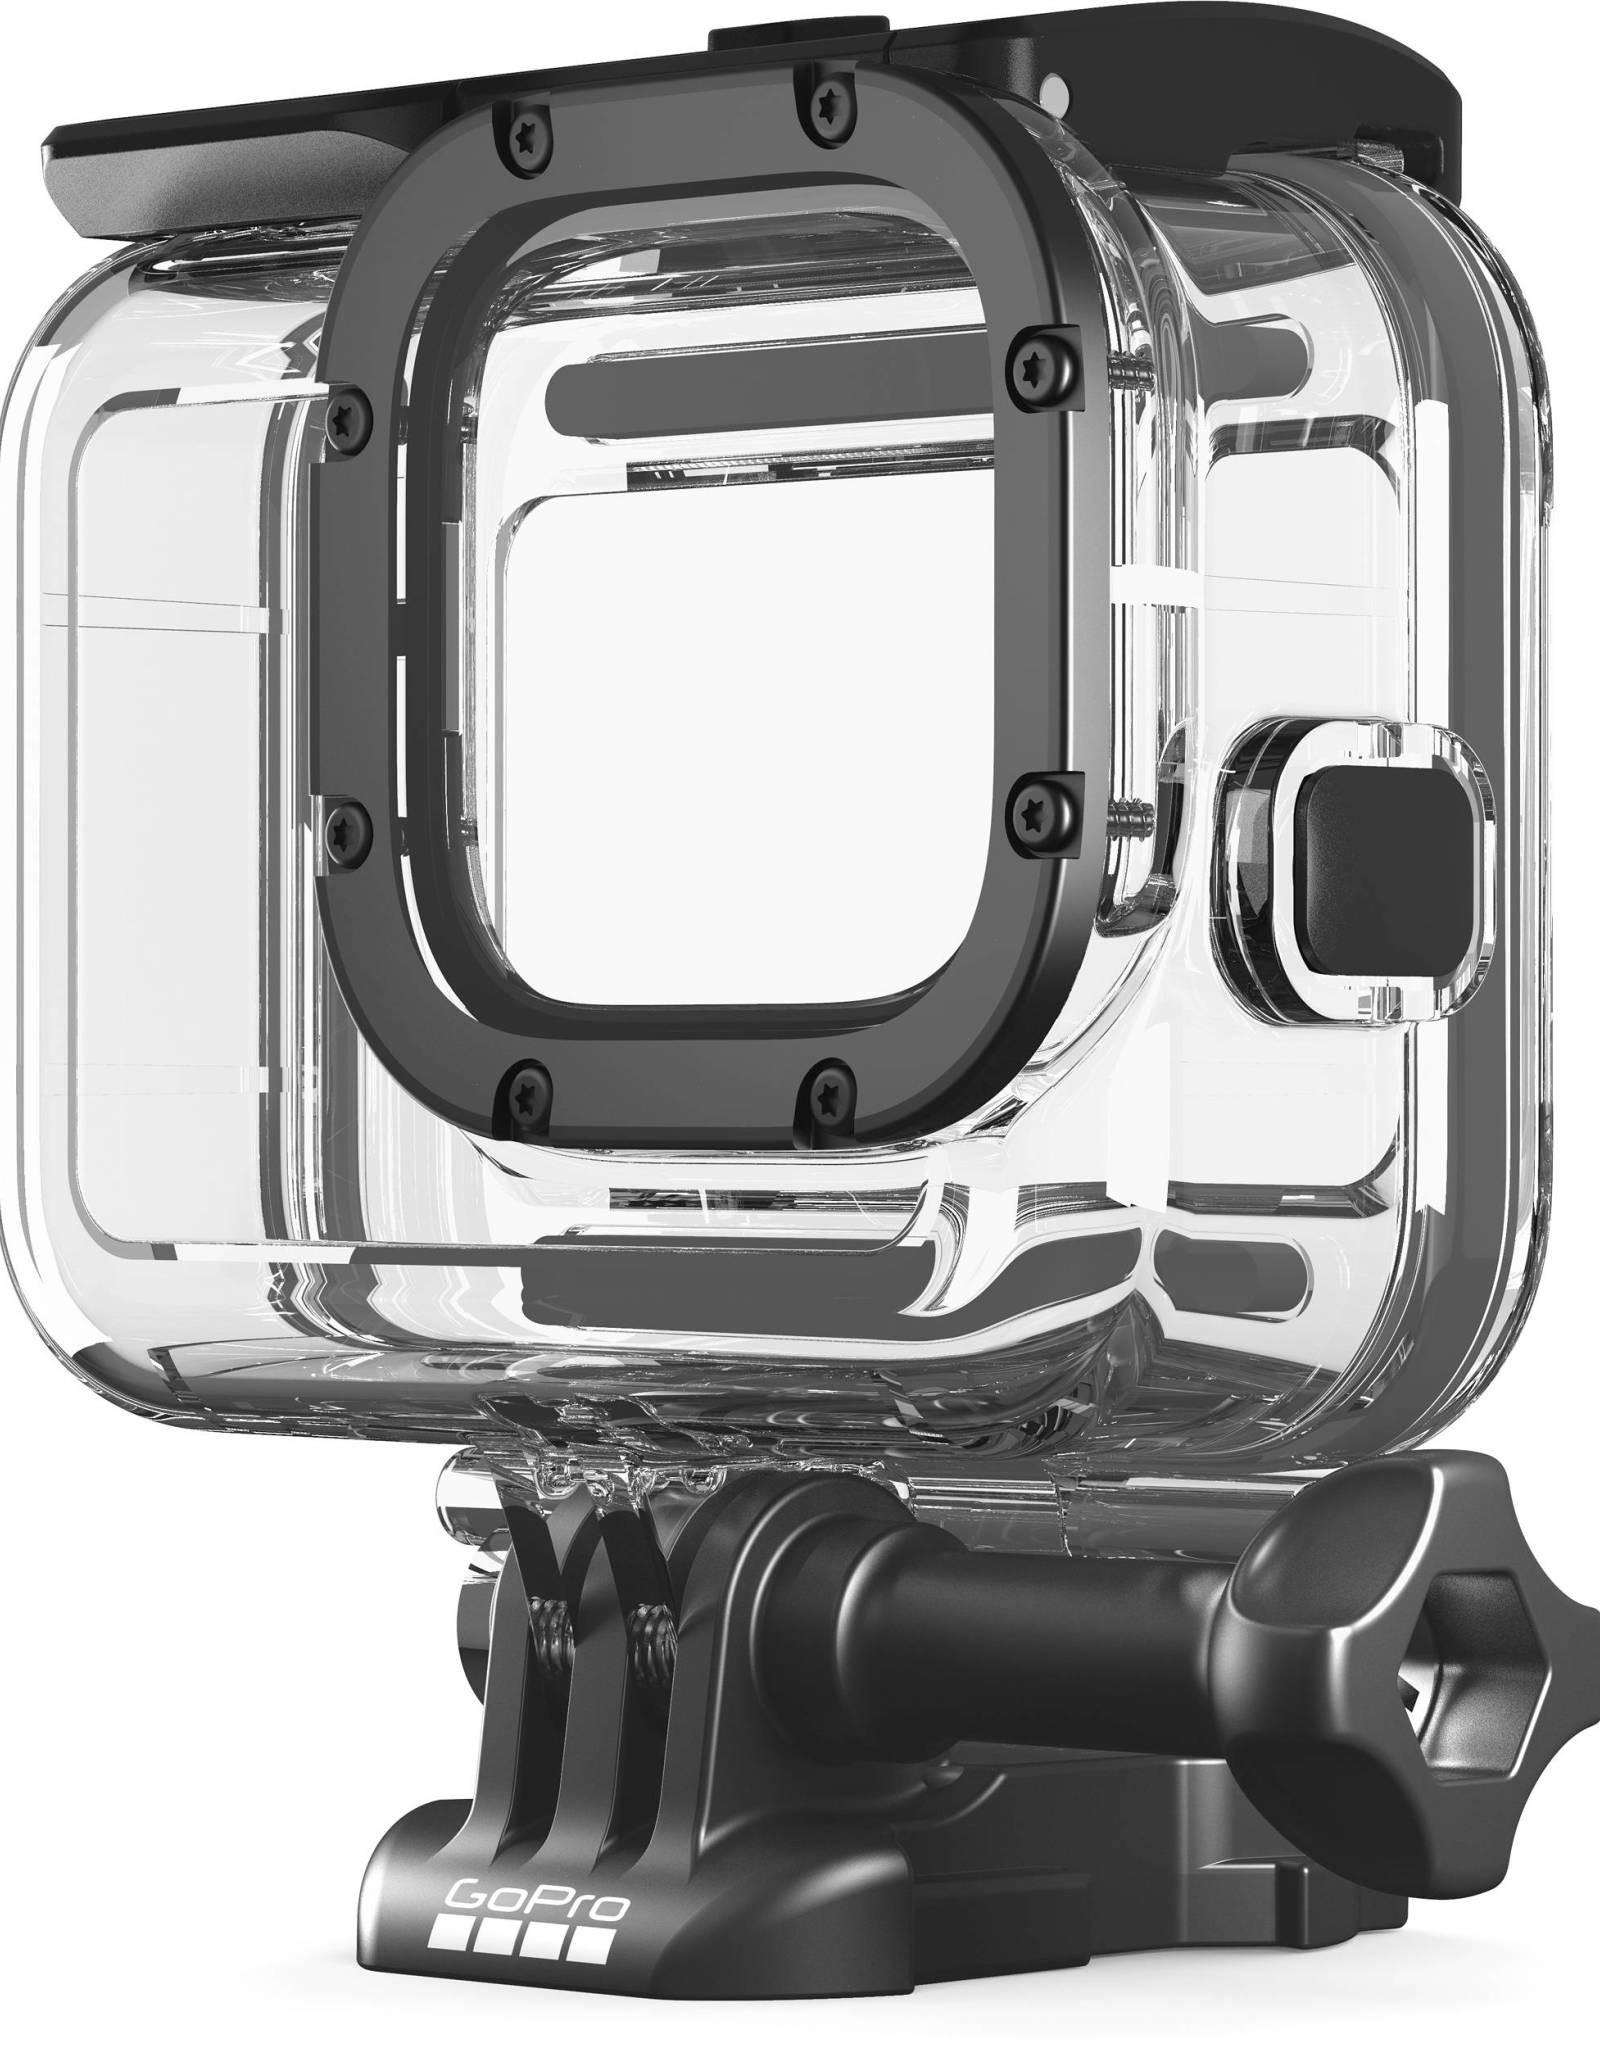 GoPro GoPro | PROTECTIVE HOUSING (HERO8 BLACK) GP-AJDIV-001